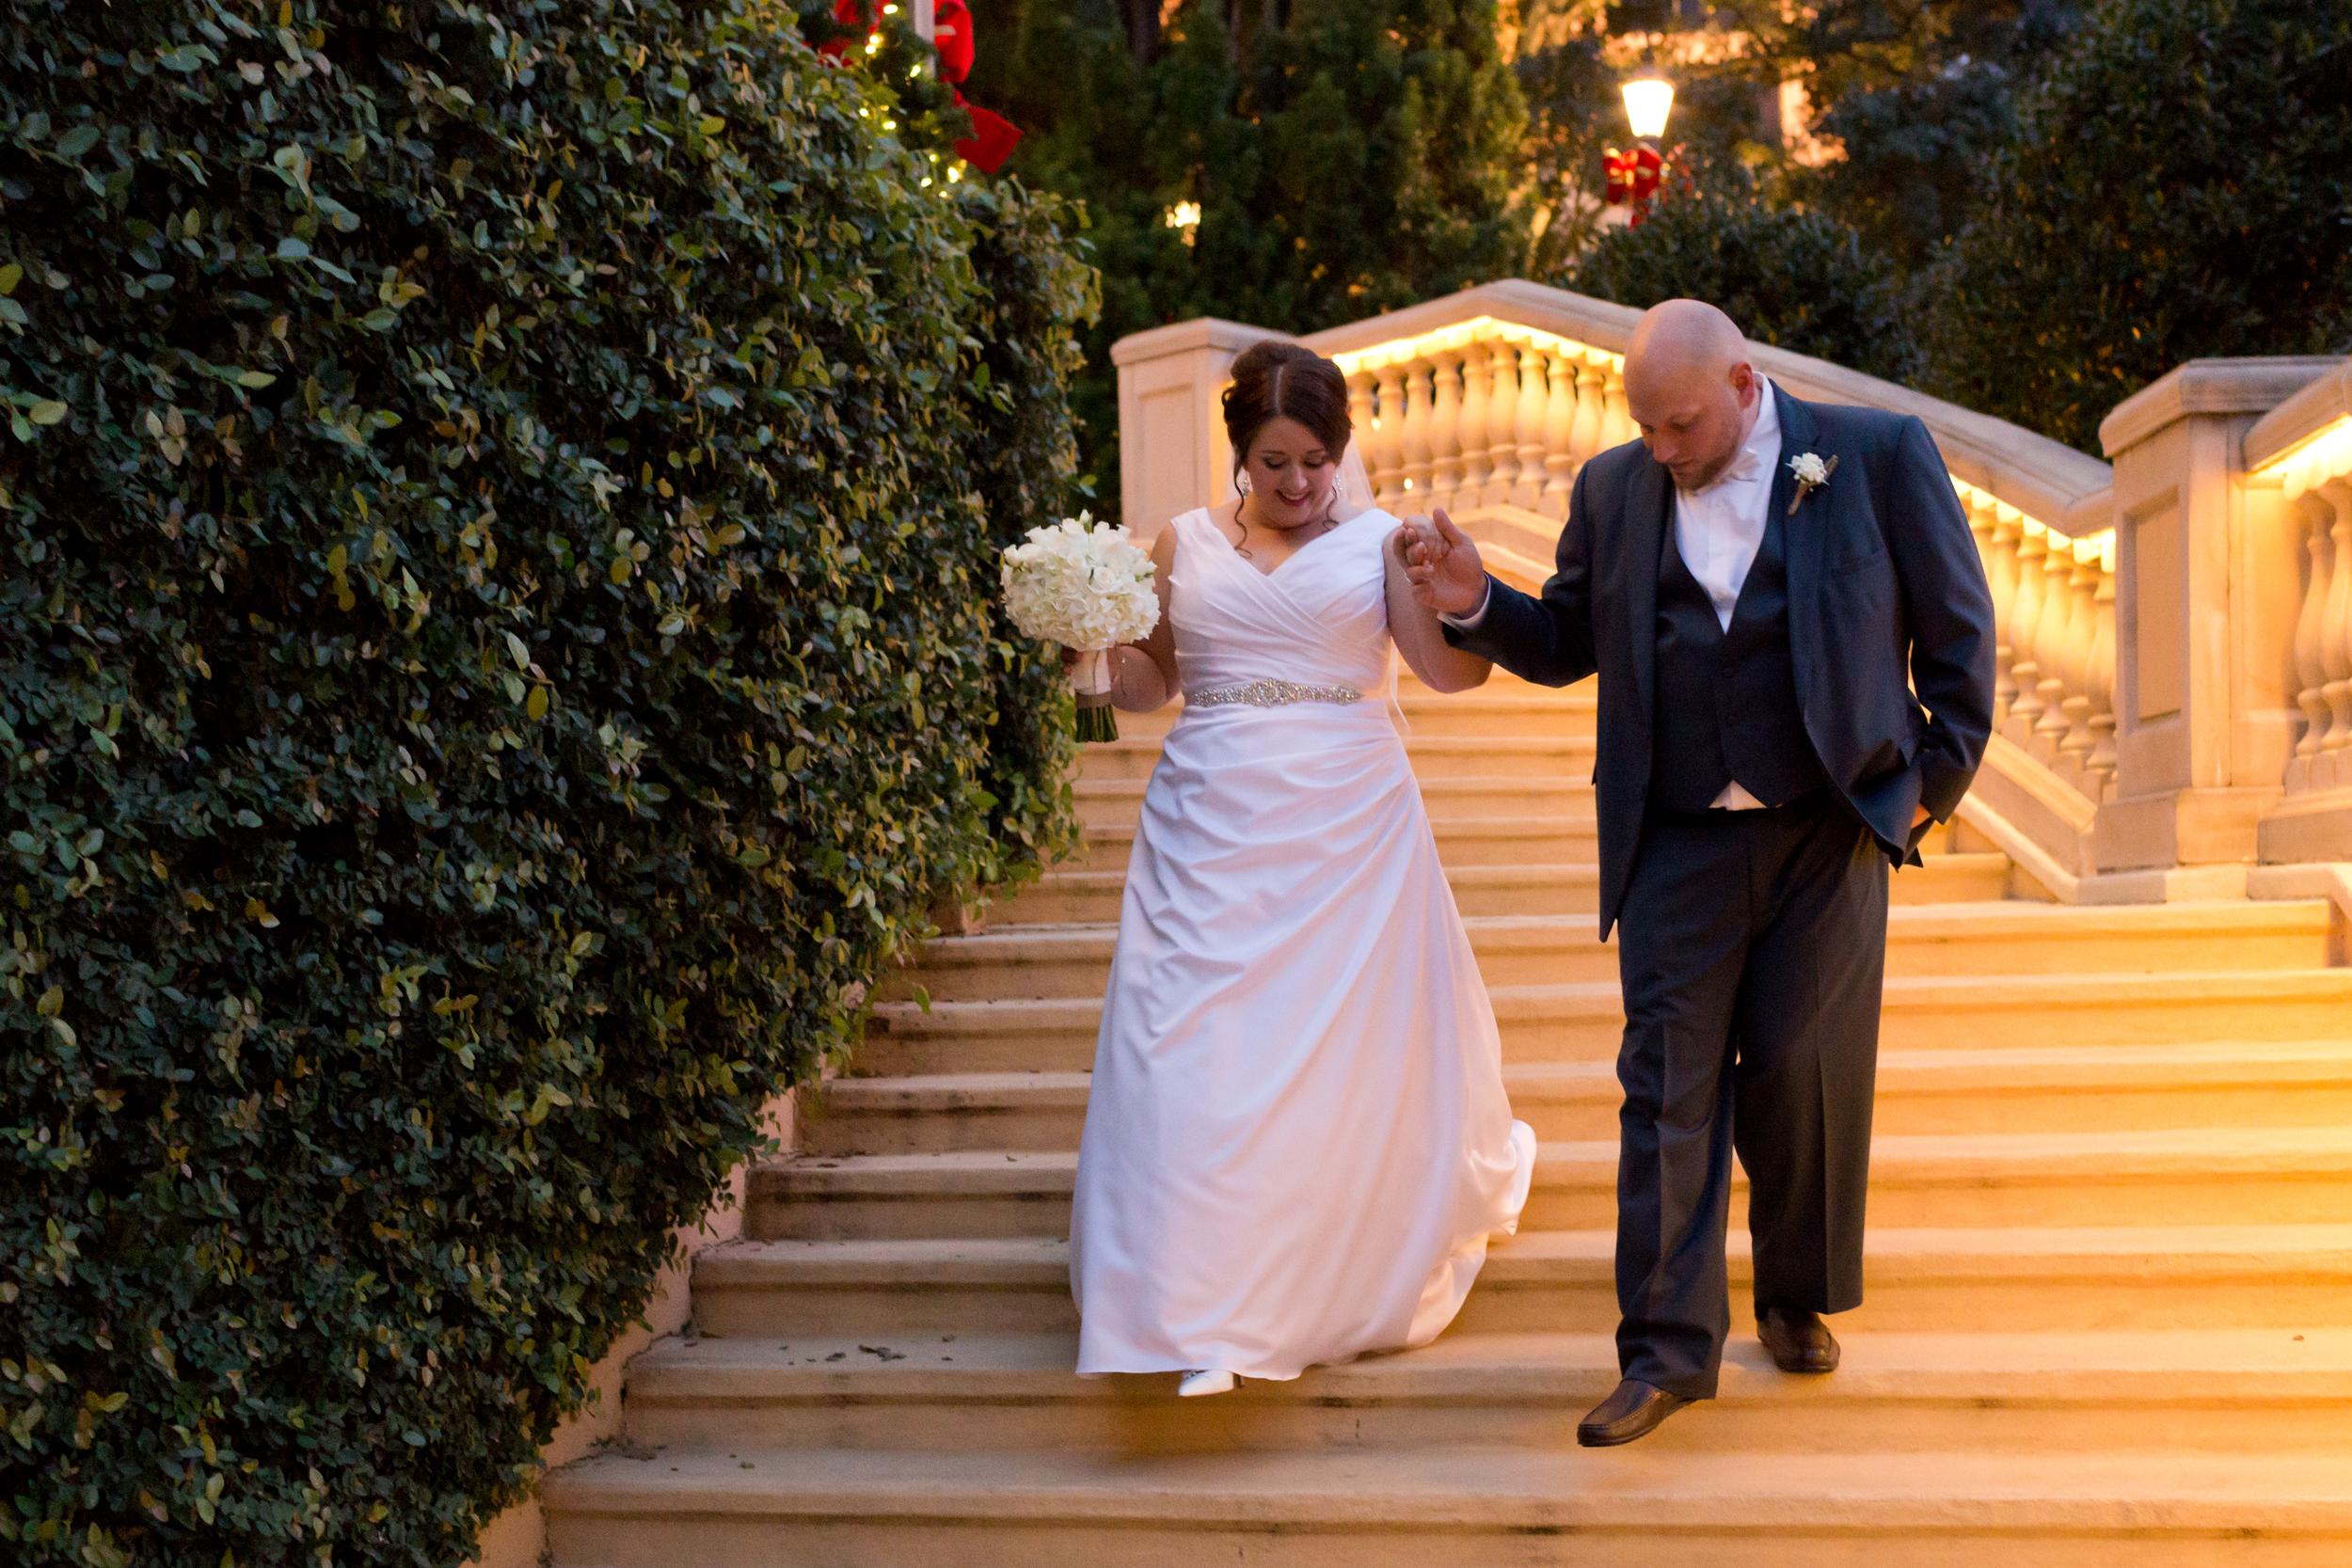 bride and groom walking down steps outside Beau Rivage (Biloxi wedding photo)